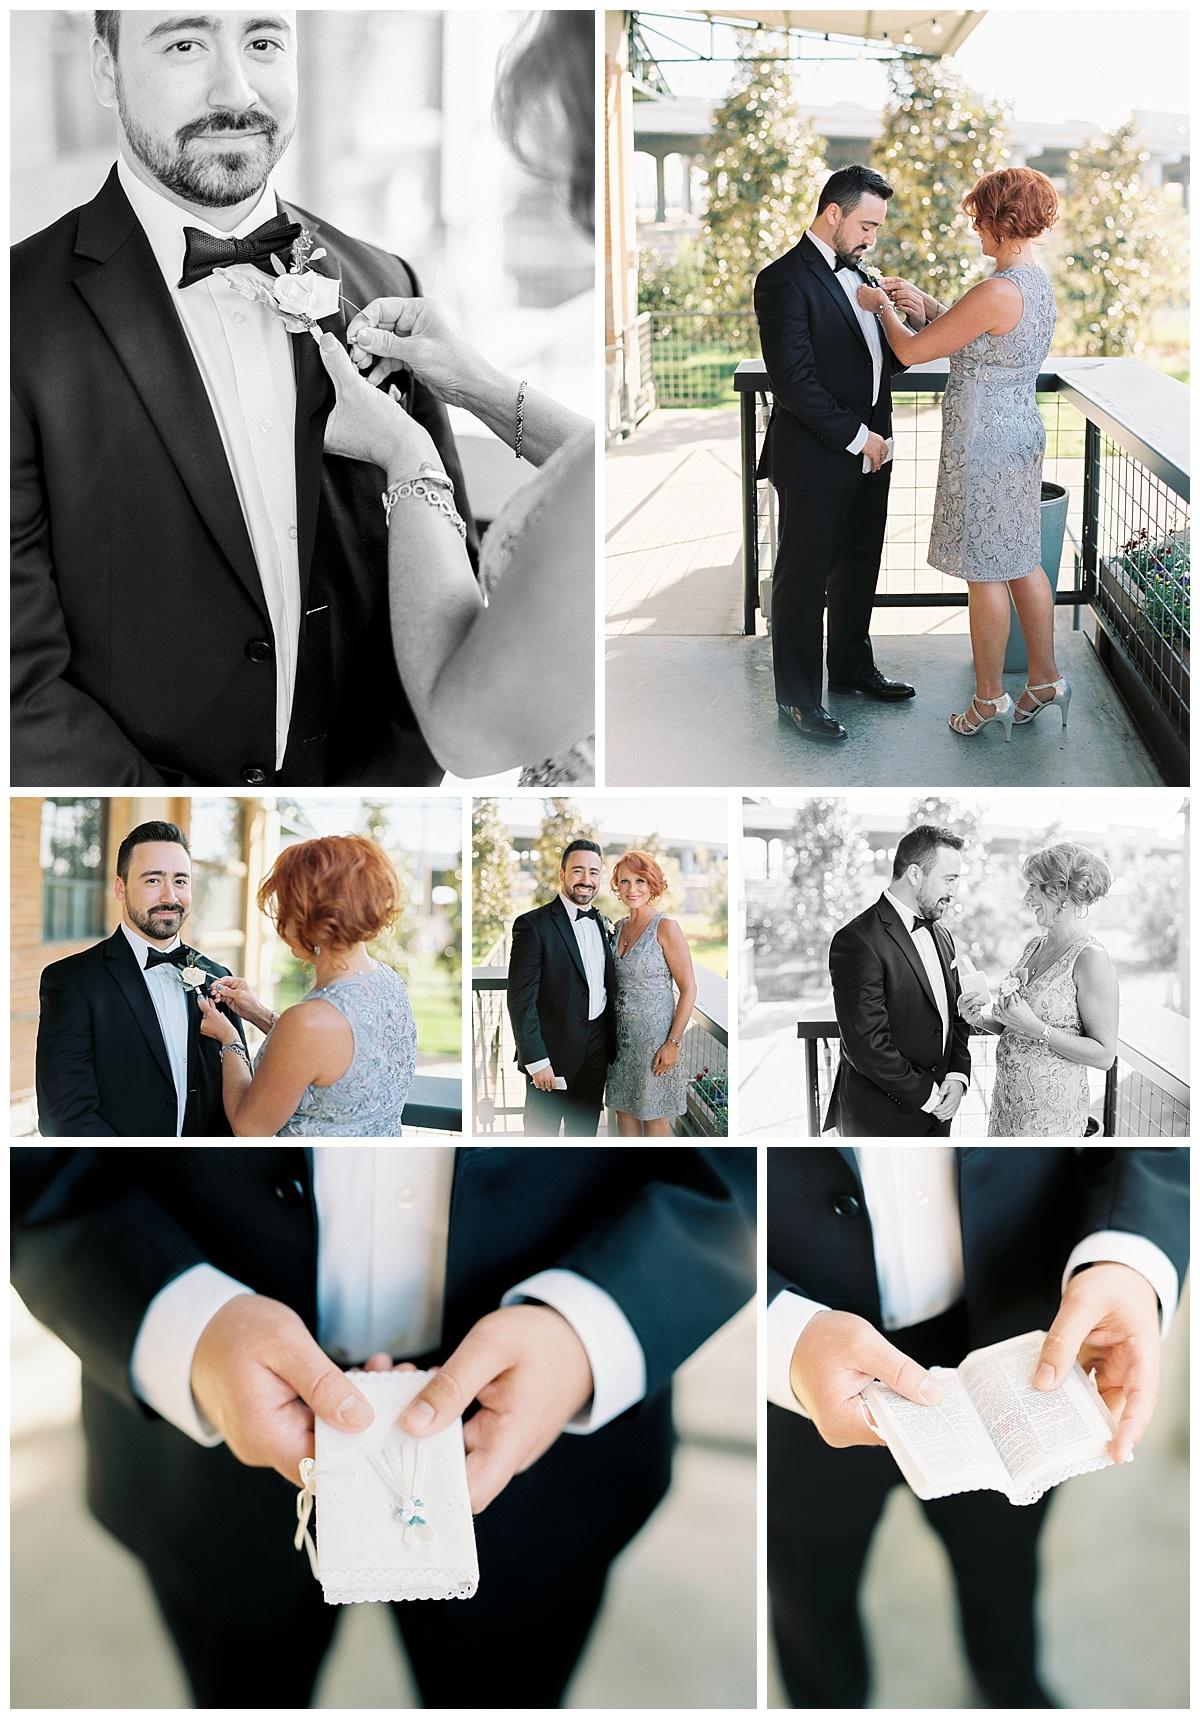 hickory-stree-annex-wedding-ar-photography-nicole-nolan-7.jpg